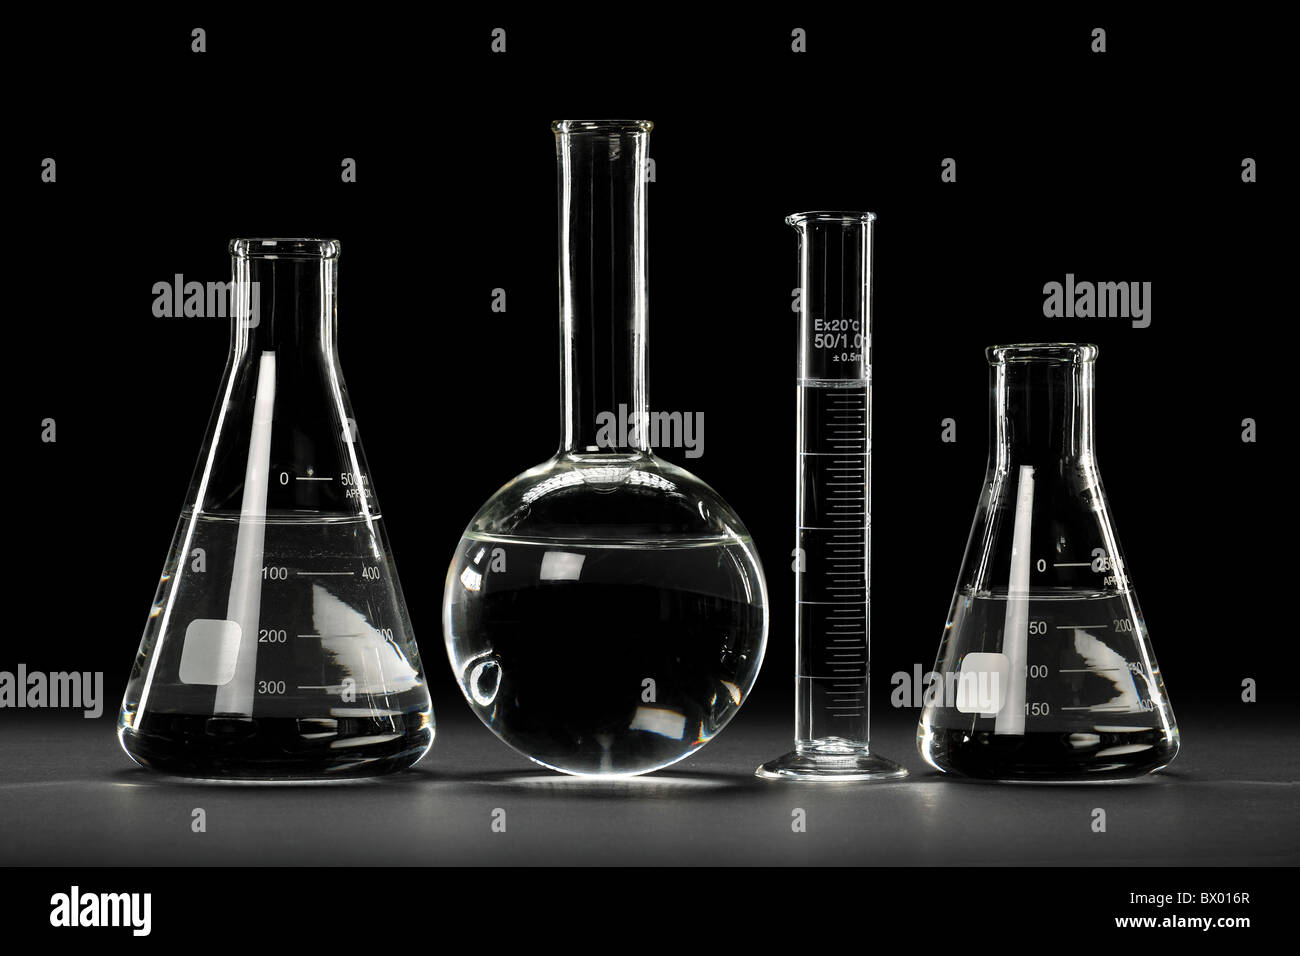 Chemistry Laboratory Test Tube Flask Stock Photos Amp Chemistry Laboratory Test Tube Flask Stock